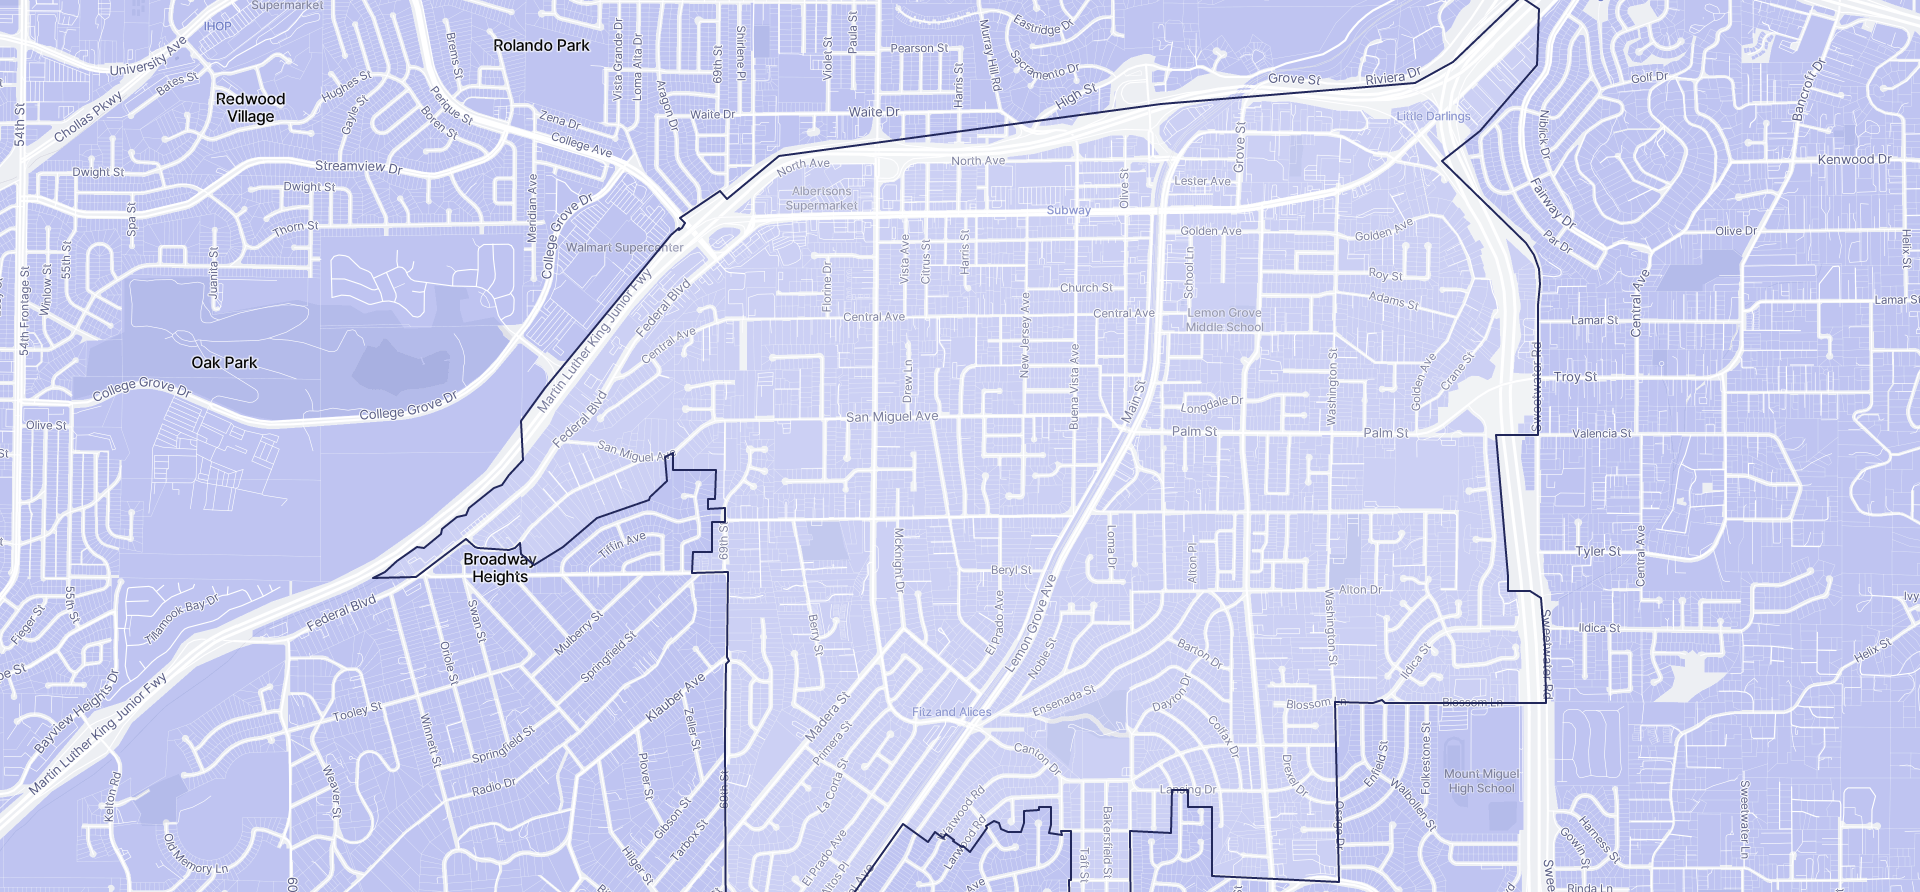 Image of Lemon Grove boundaries on a map.